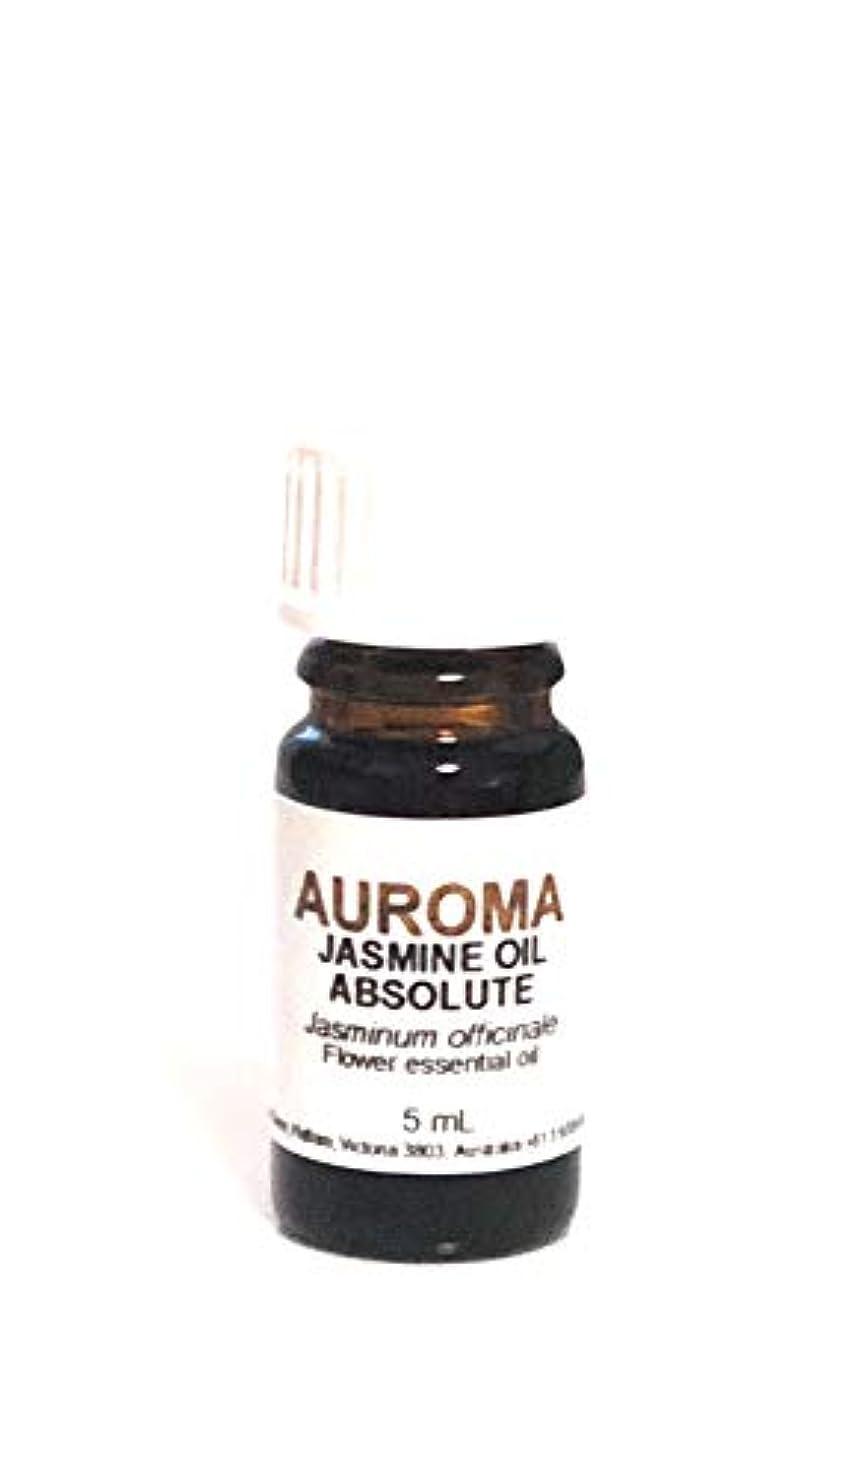 AUROMA ジャスミン abs 5ml